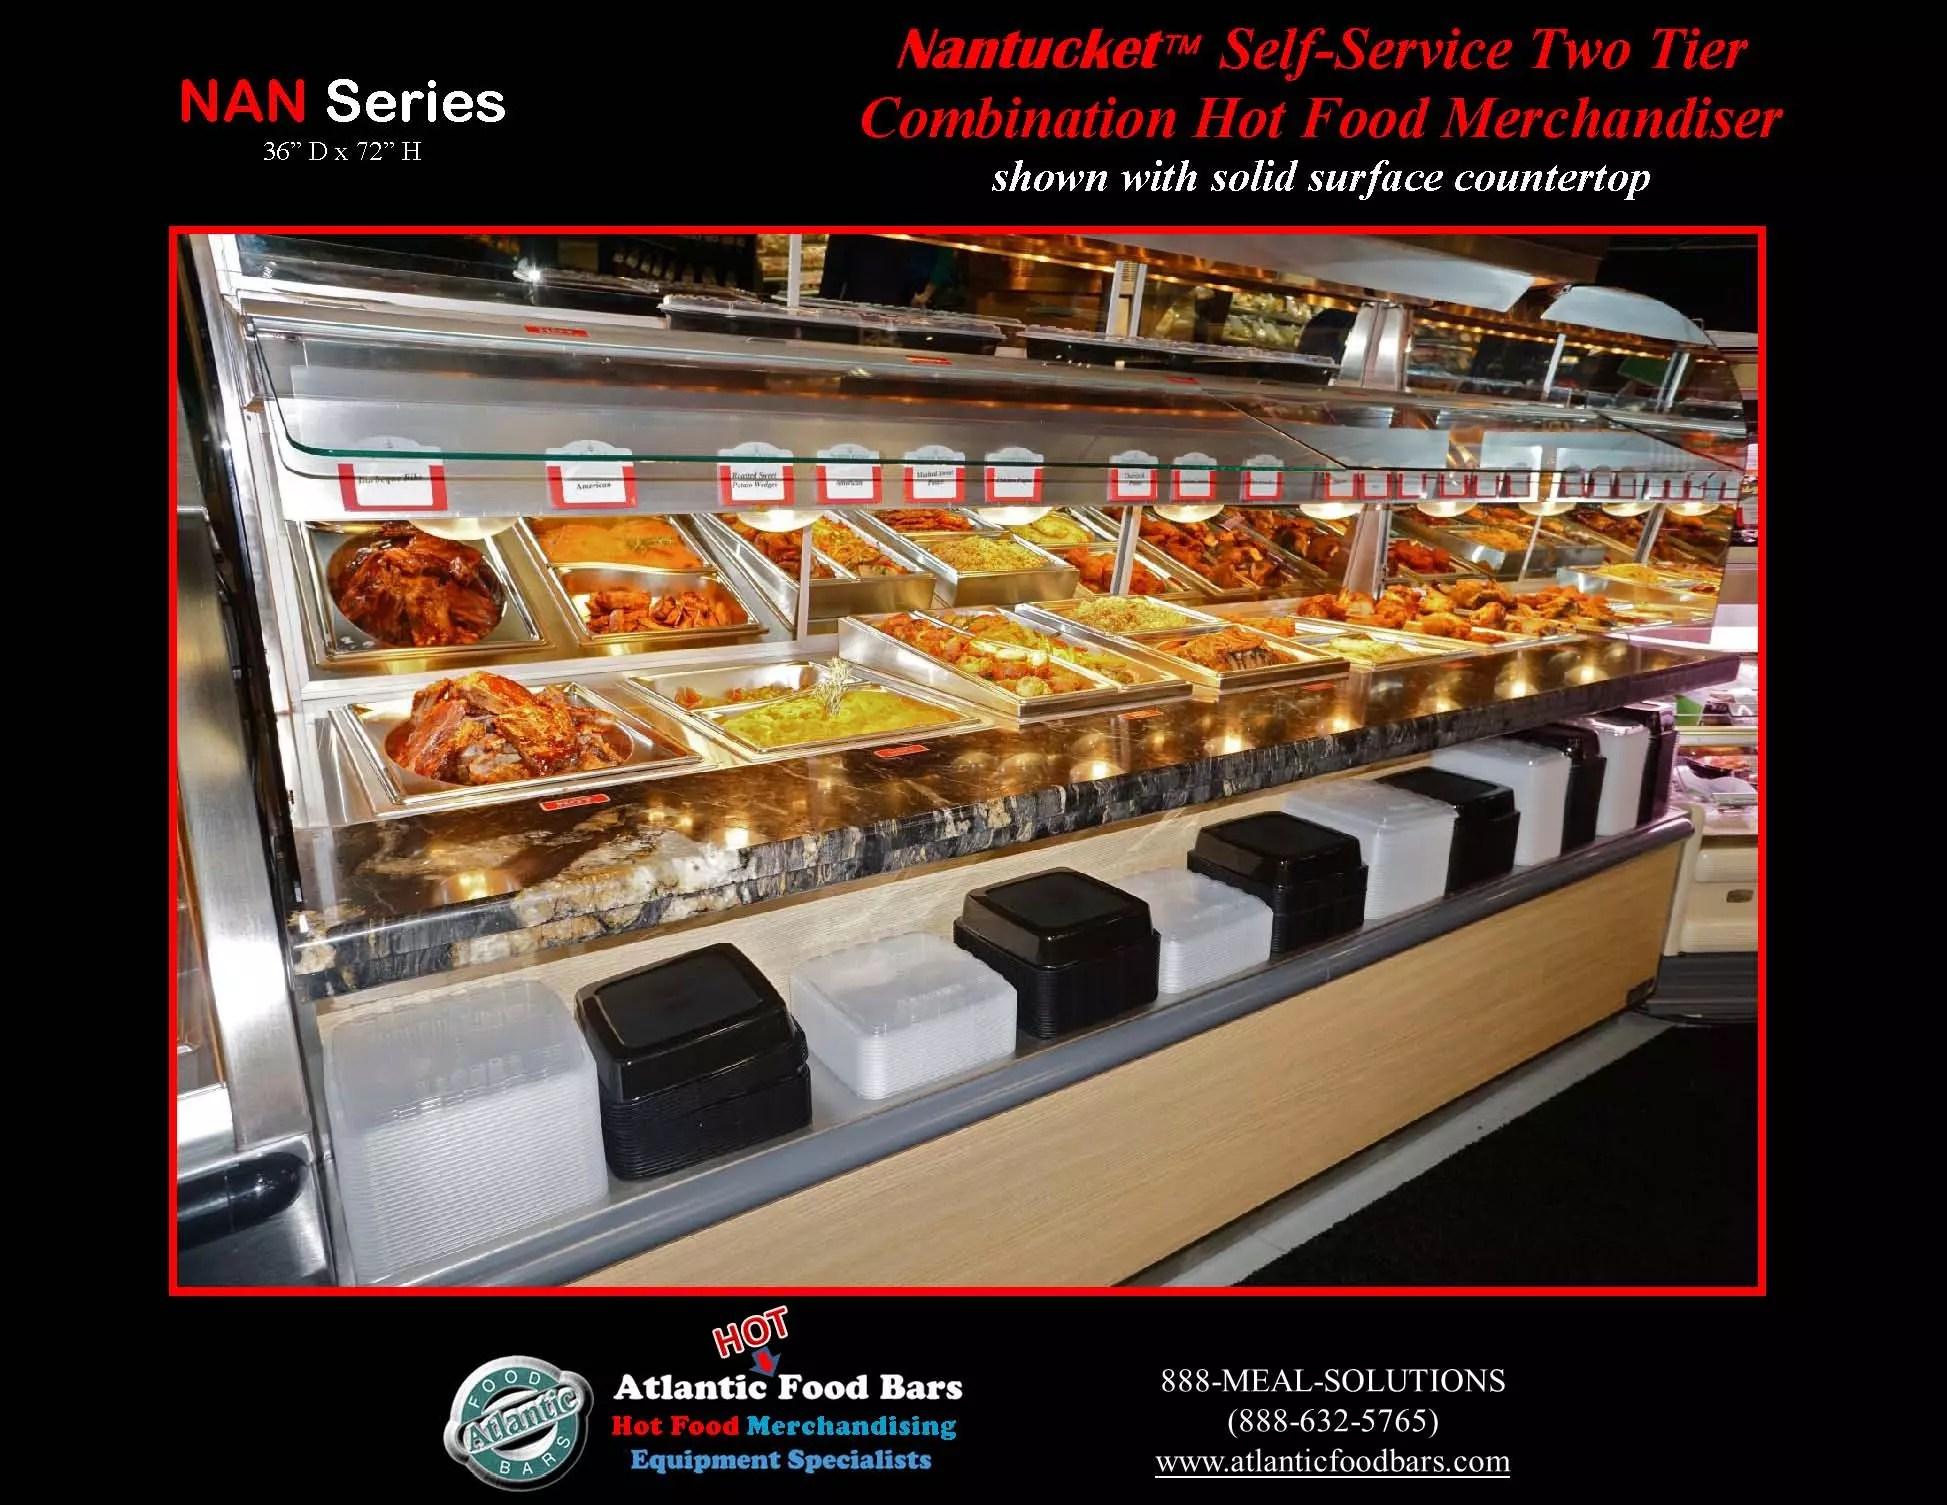 Atlantic Food Bars - Nantucket 2-Tier Combination Hot Case   The ...